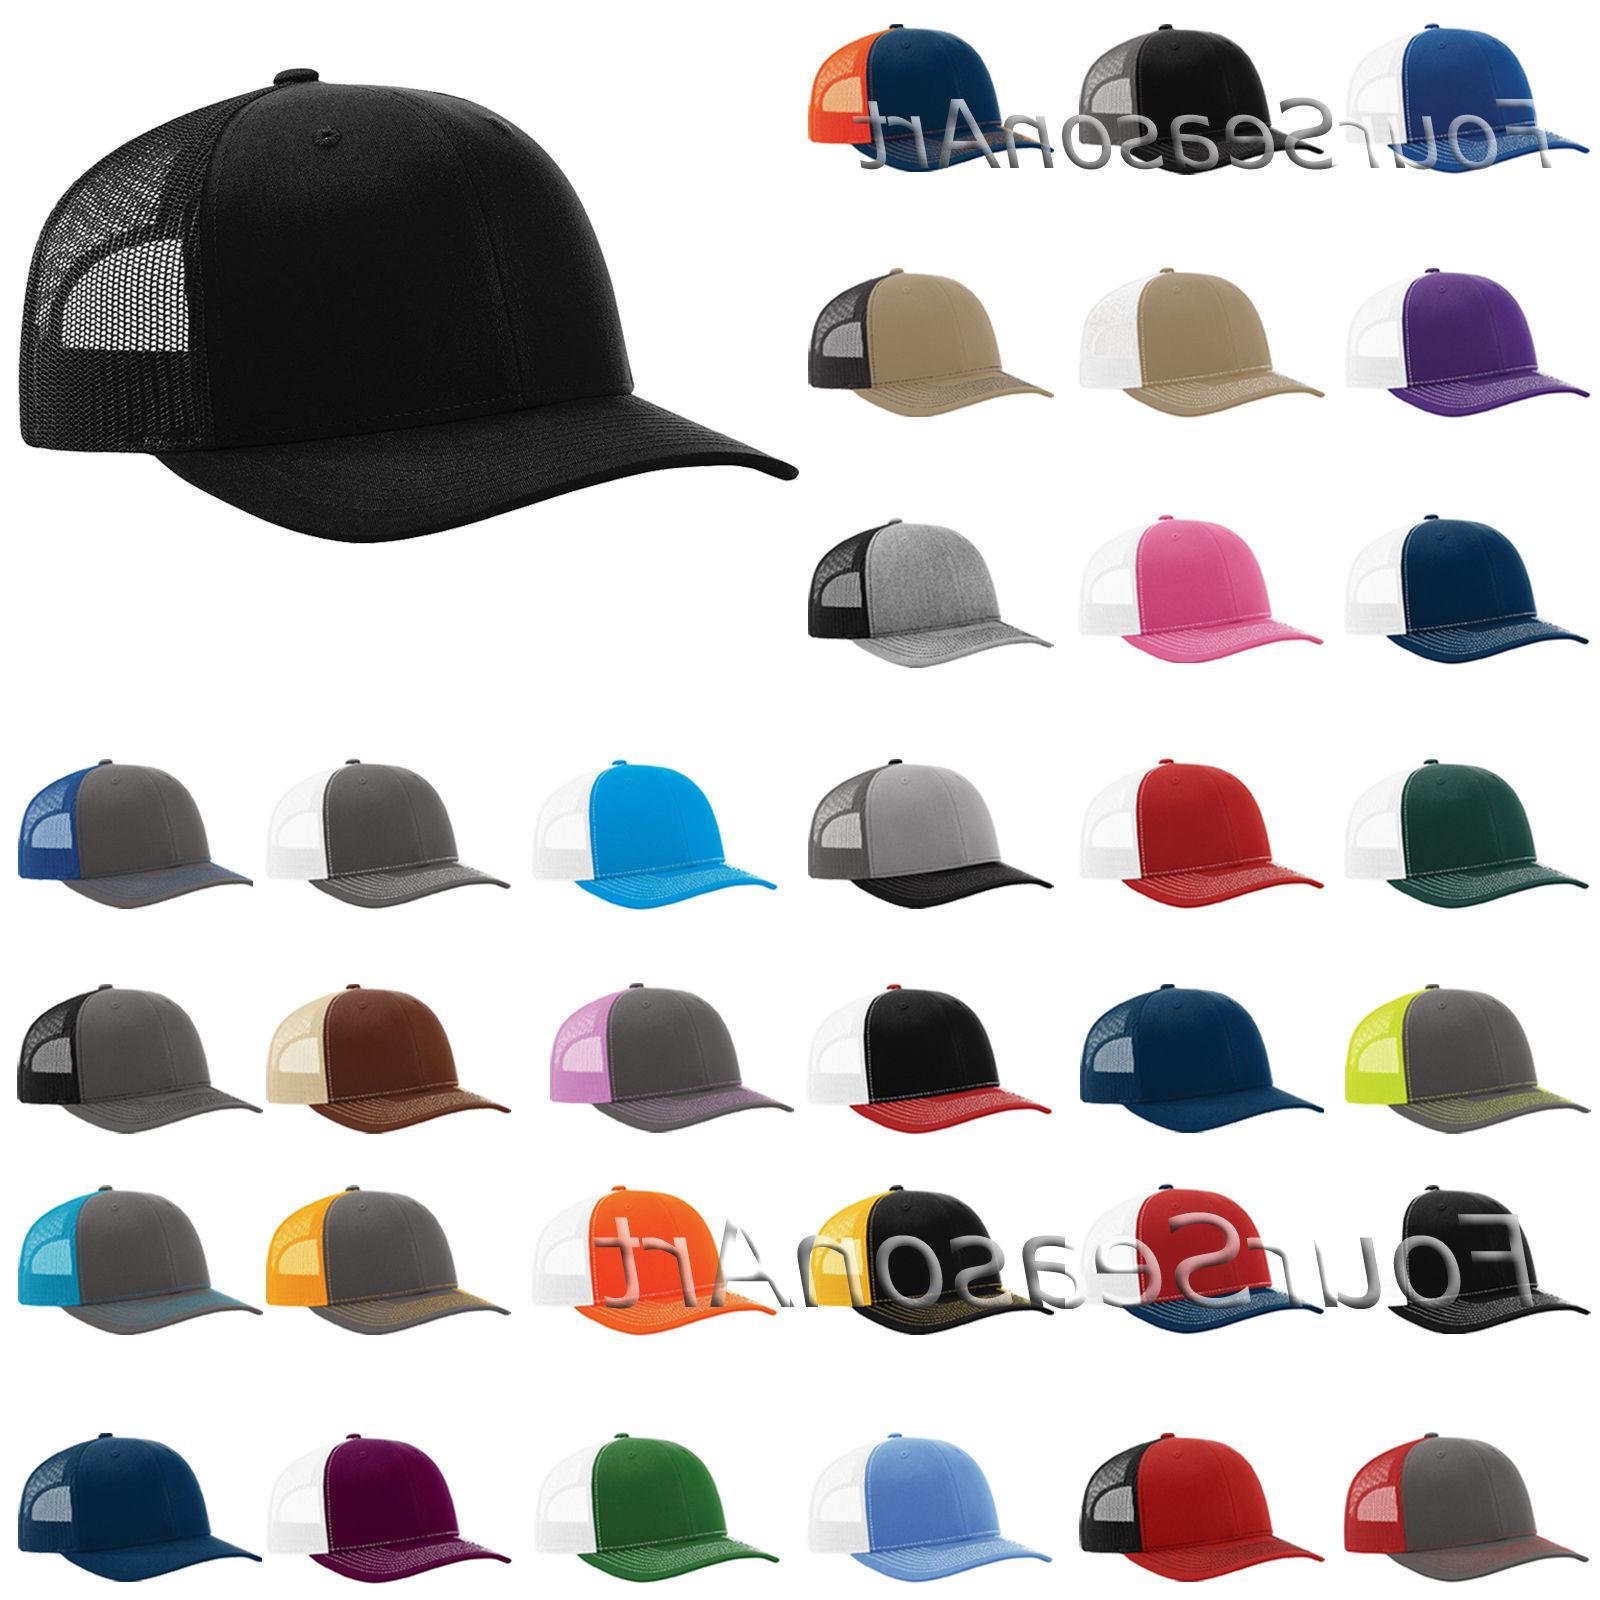 Richardson Trucker Cap Meshback Hat Cap-112